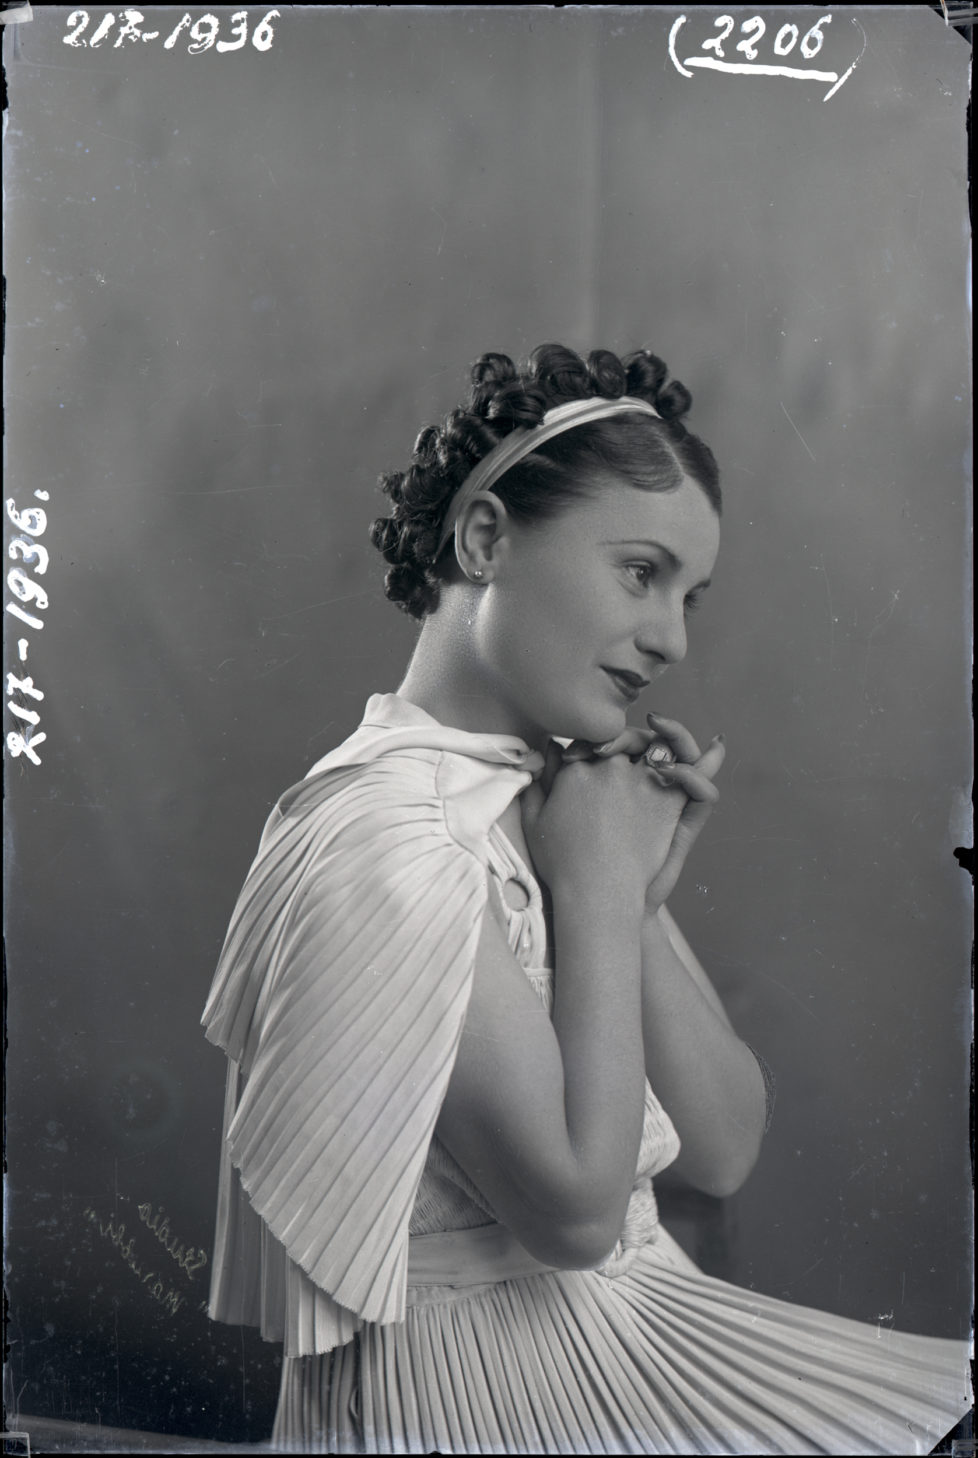 Tefta Tashko, 1936 C Geg+½ Marubi Courtesy Marubi National Museum of Photography, Shkod+½r.